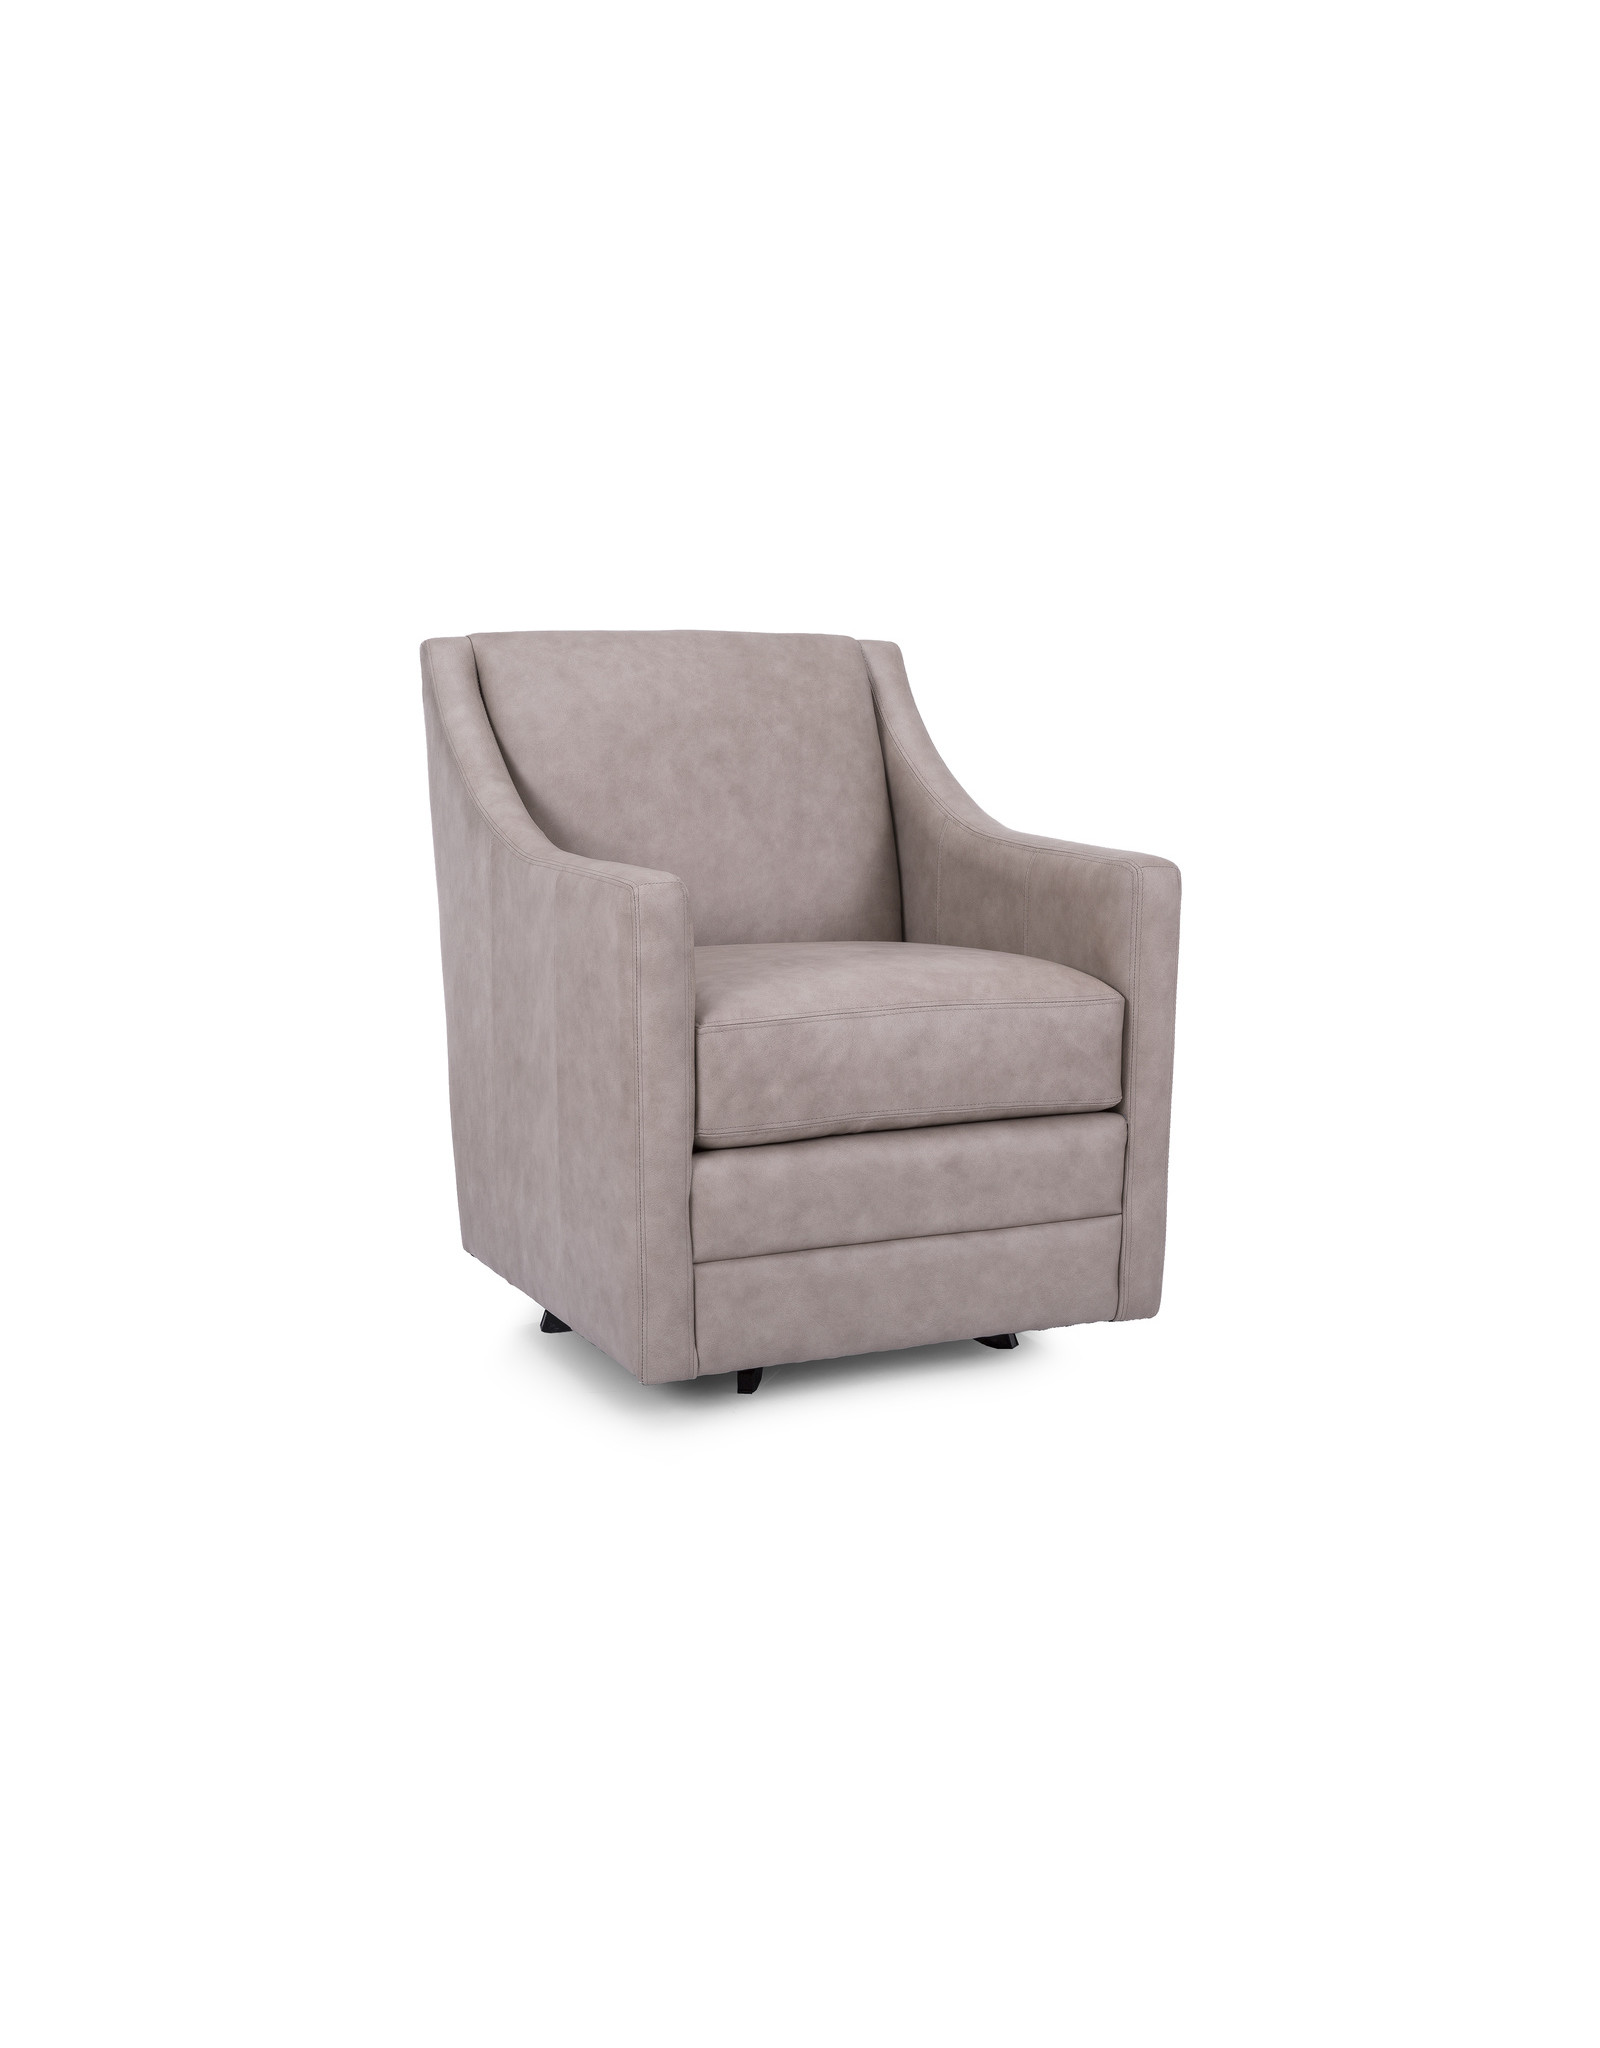 TCE 3443 Swivel Chair